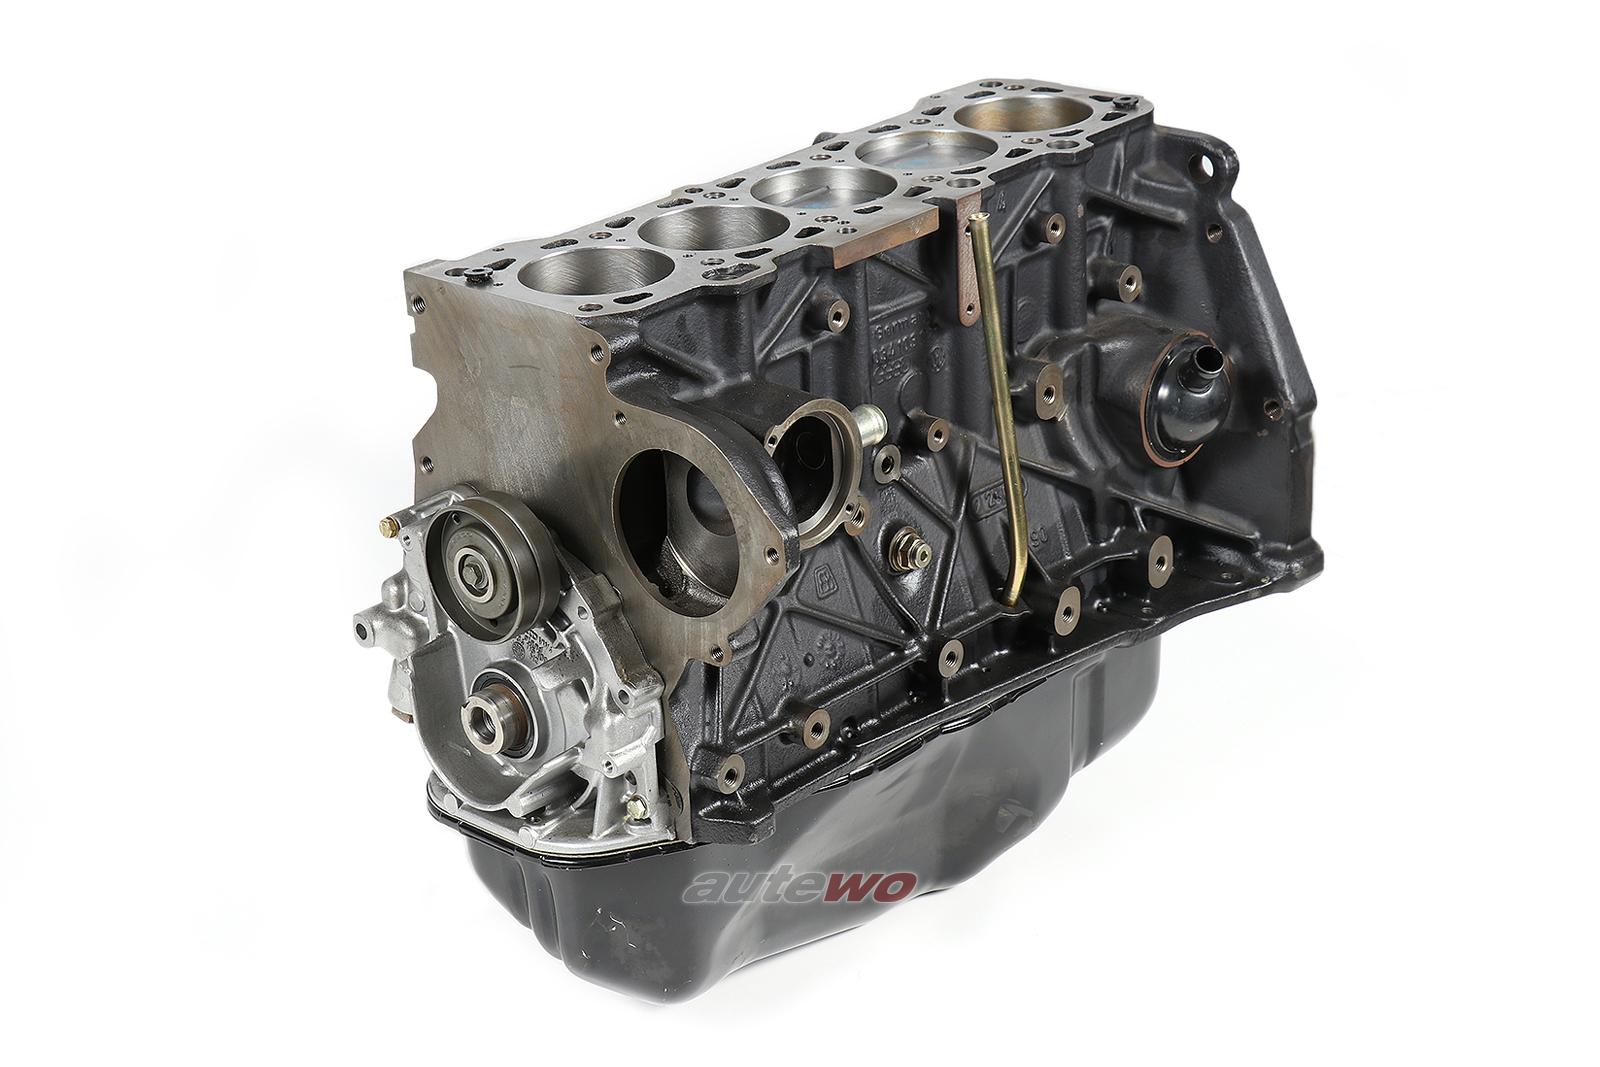 035100104 X NEU Audi/VW 90/Coupe Typ 81 2.0l 5 Zyl. HP/JS/SK Teilmotor